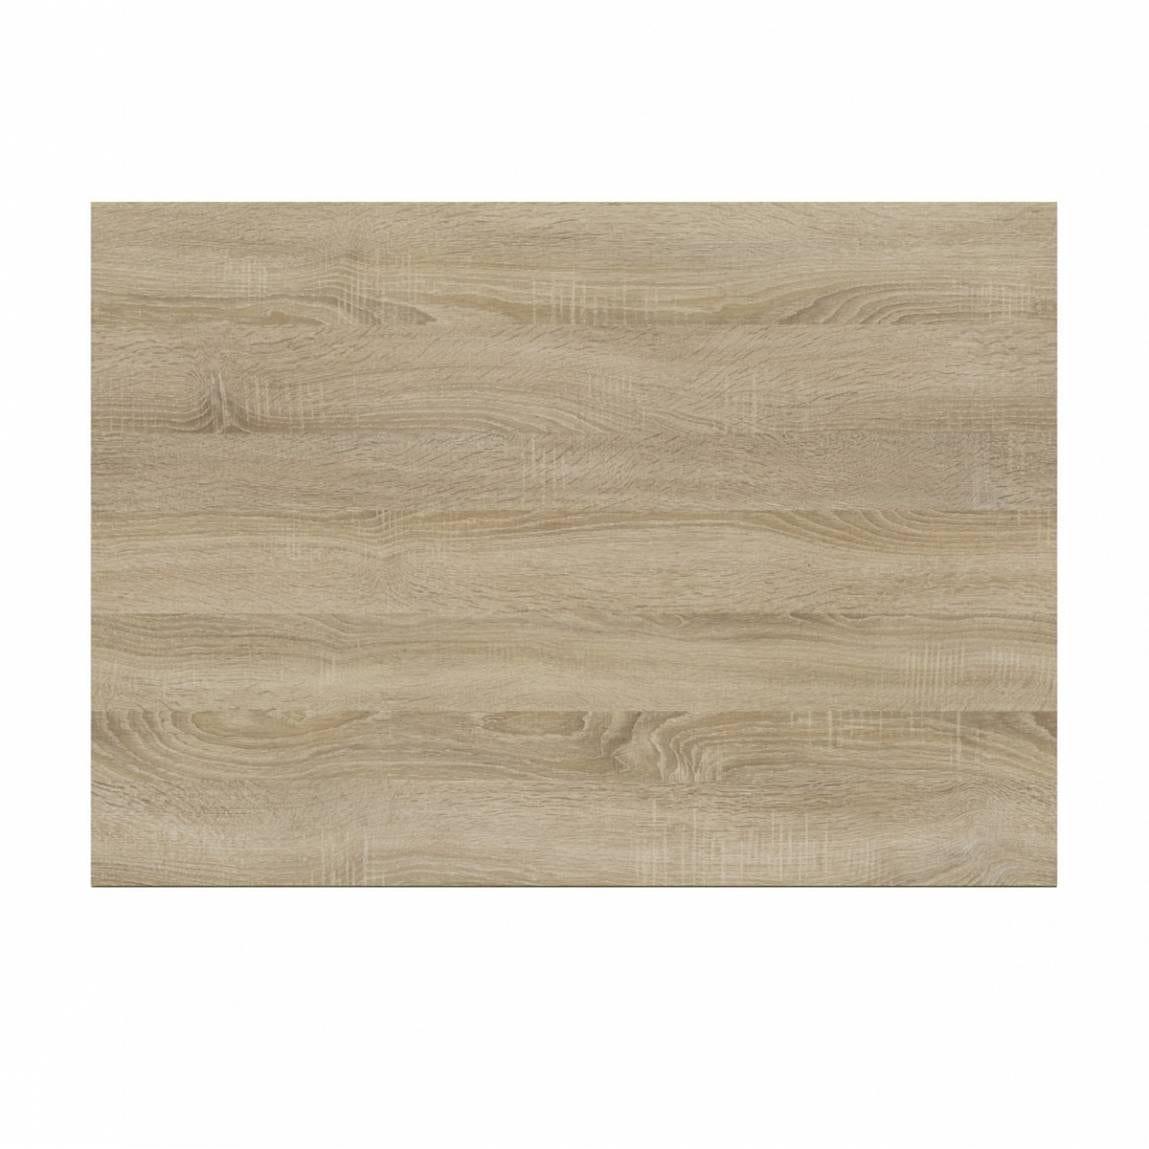 L shaped shower bath wooden end panel Drift sawn oak 700mm